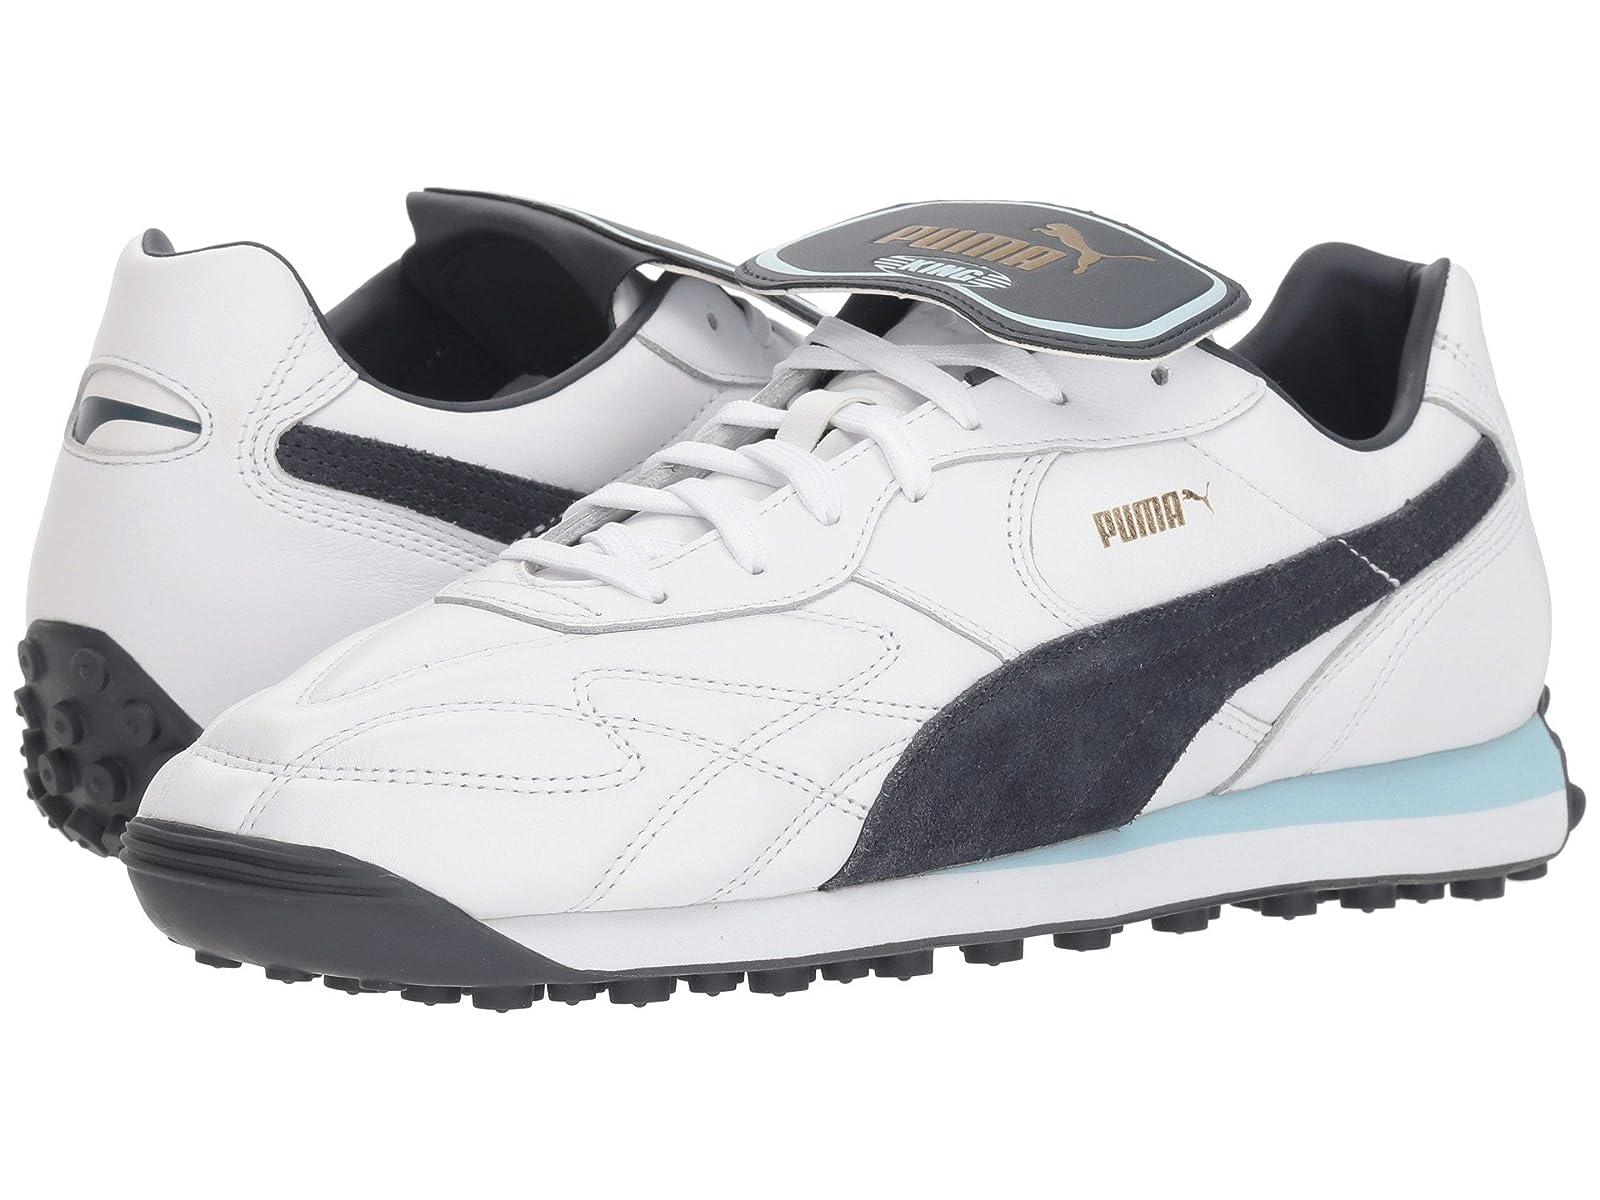 PUMA King Avanti (Legends Pack)Atmospheric grades have affordable shoes